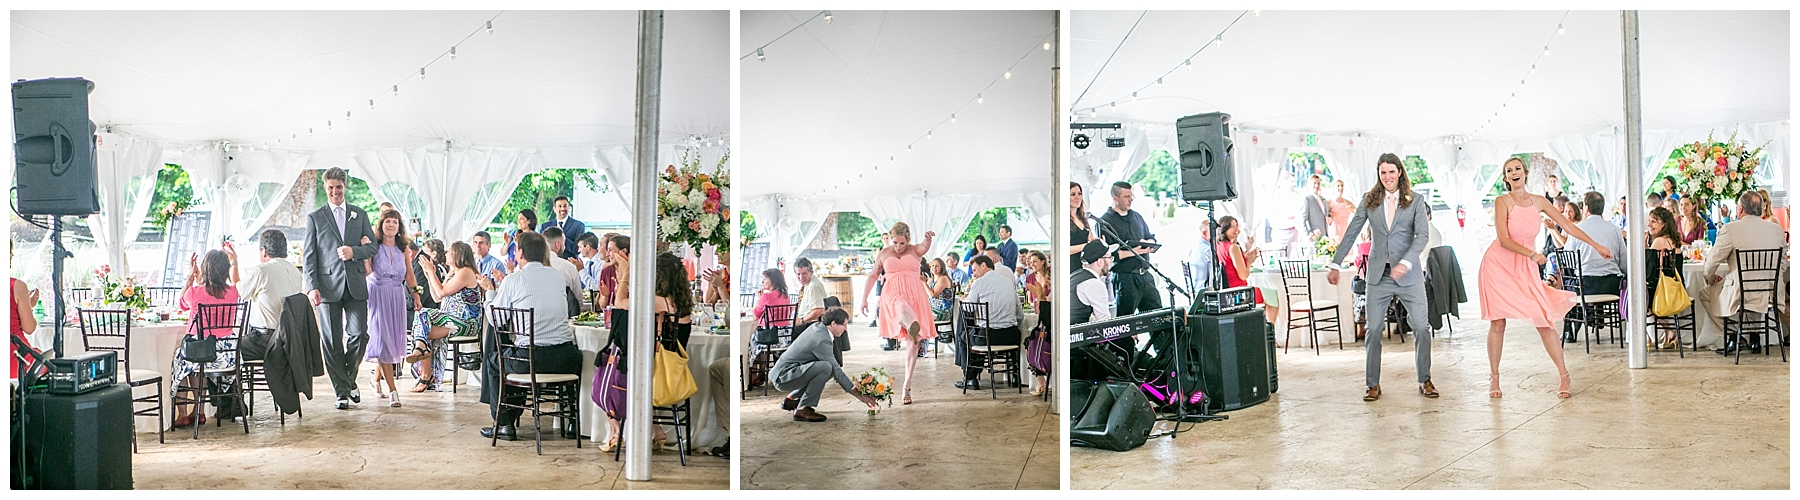 Chelsea Phil Bohemia River Overlook Wedding Living Radiant Photography photos_0124.jpg